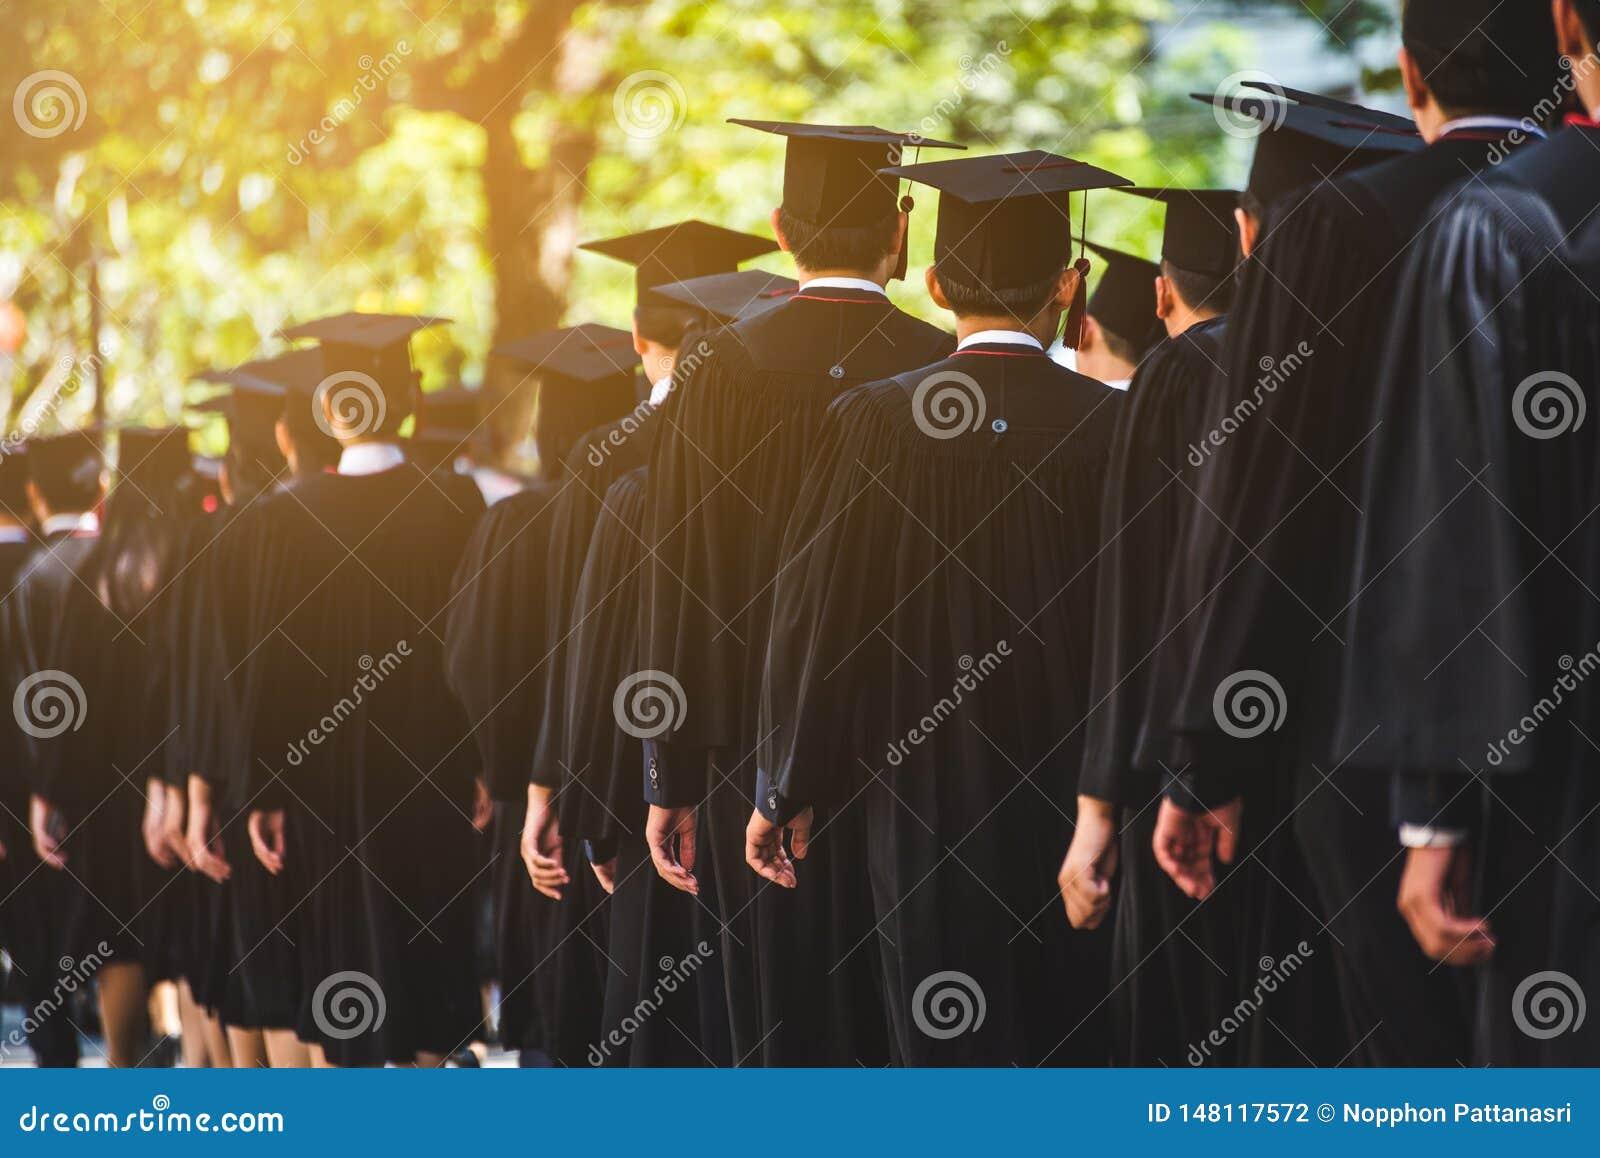 Education graduation in university theme concept.